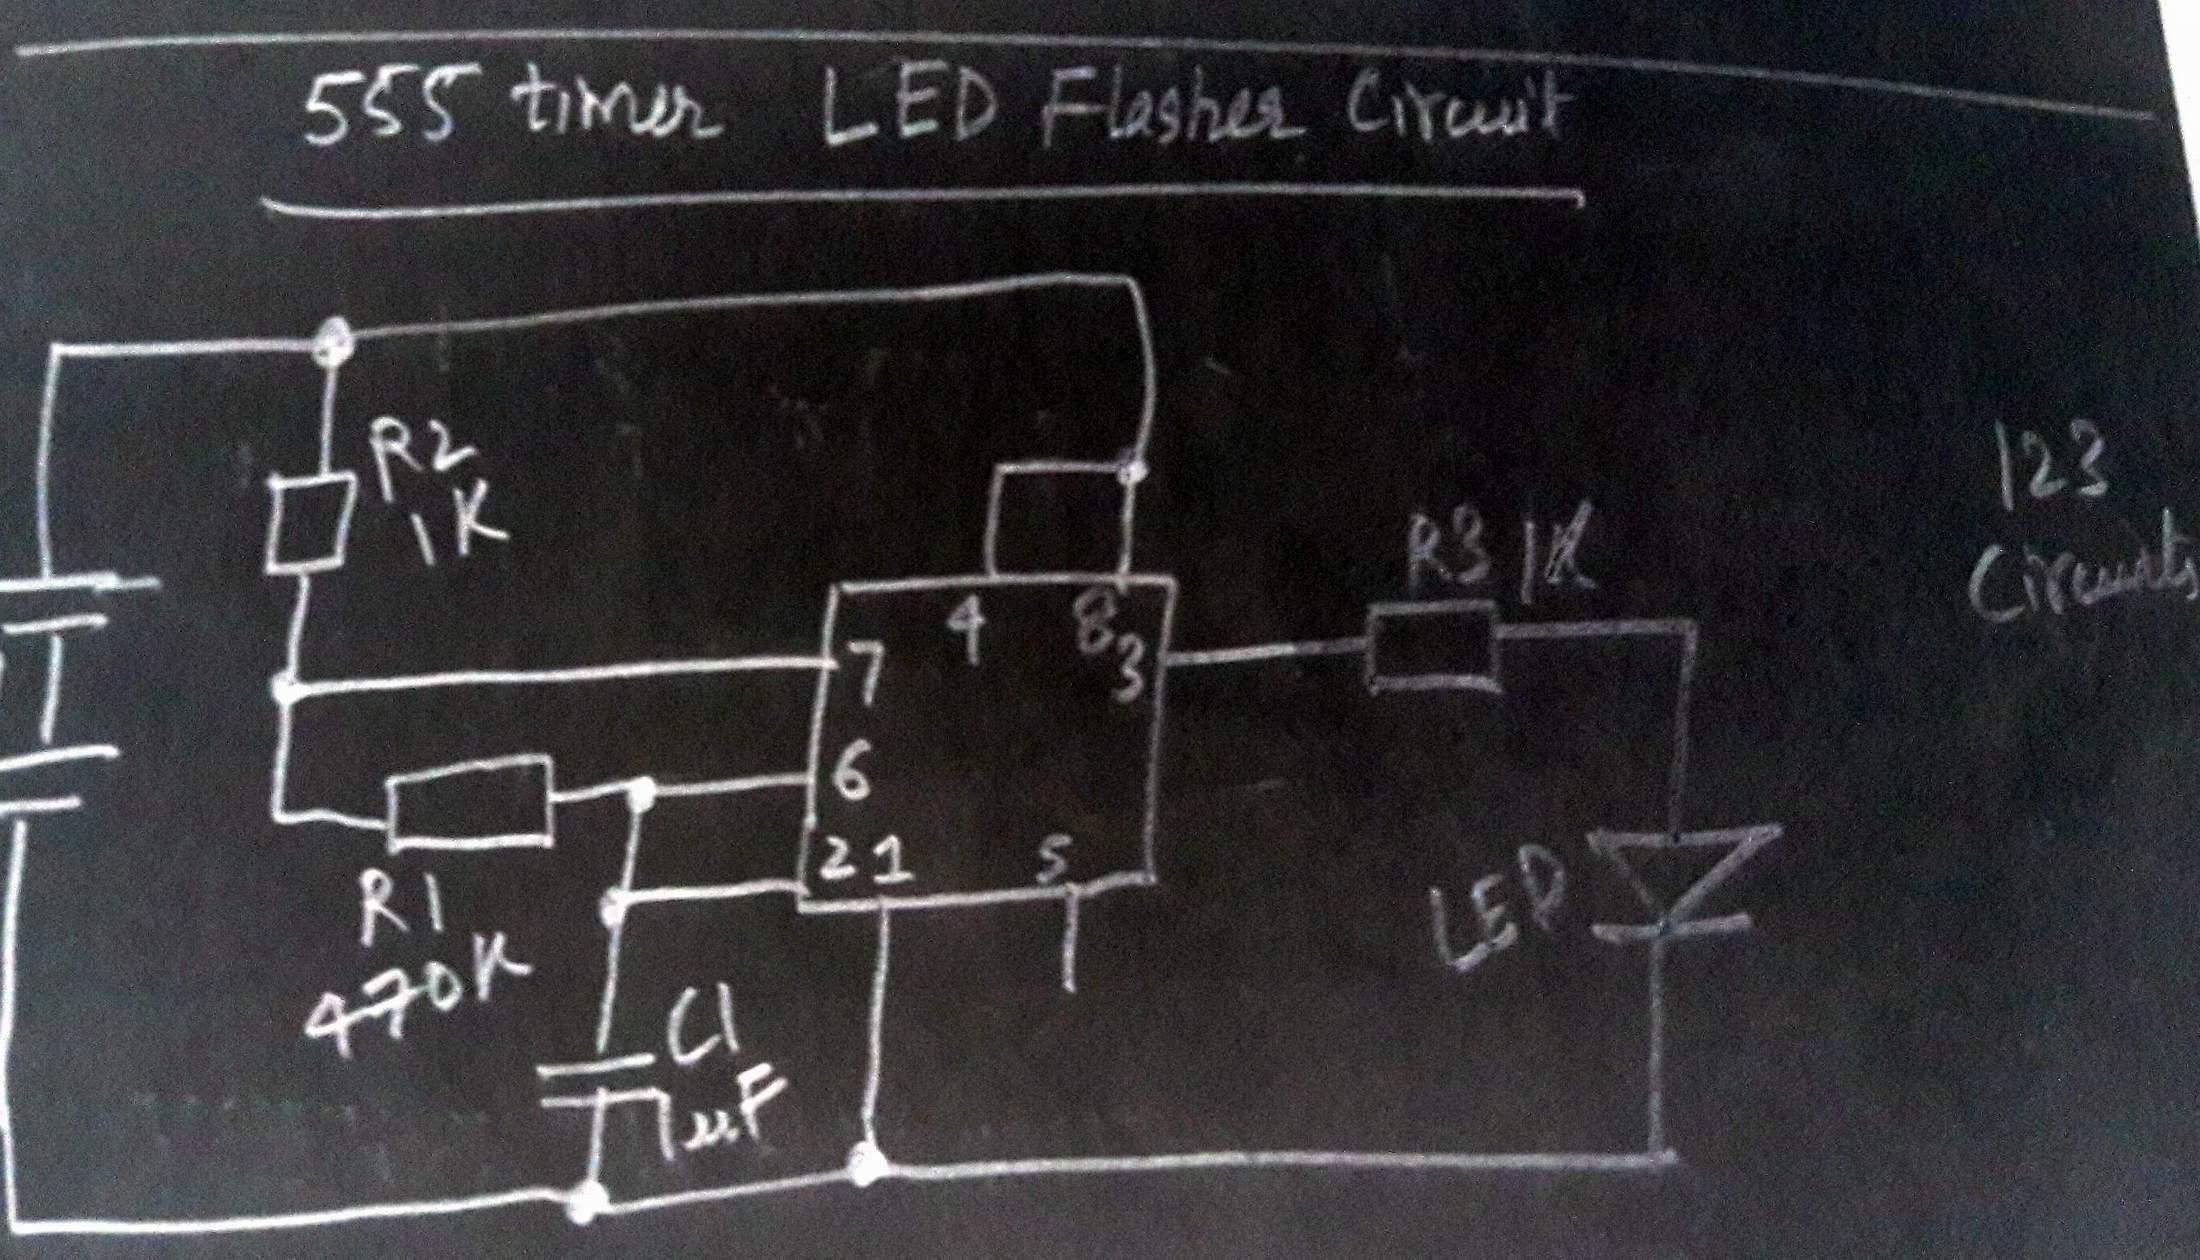 Electronics Circuits Schematics Contract Manufacturers Pcb Arduino Ac Light Dimmer Circuit Scr Lamp Triac Diac